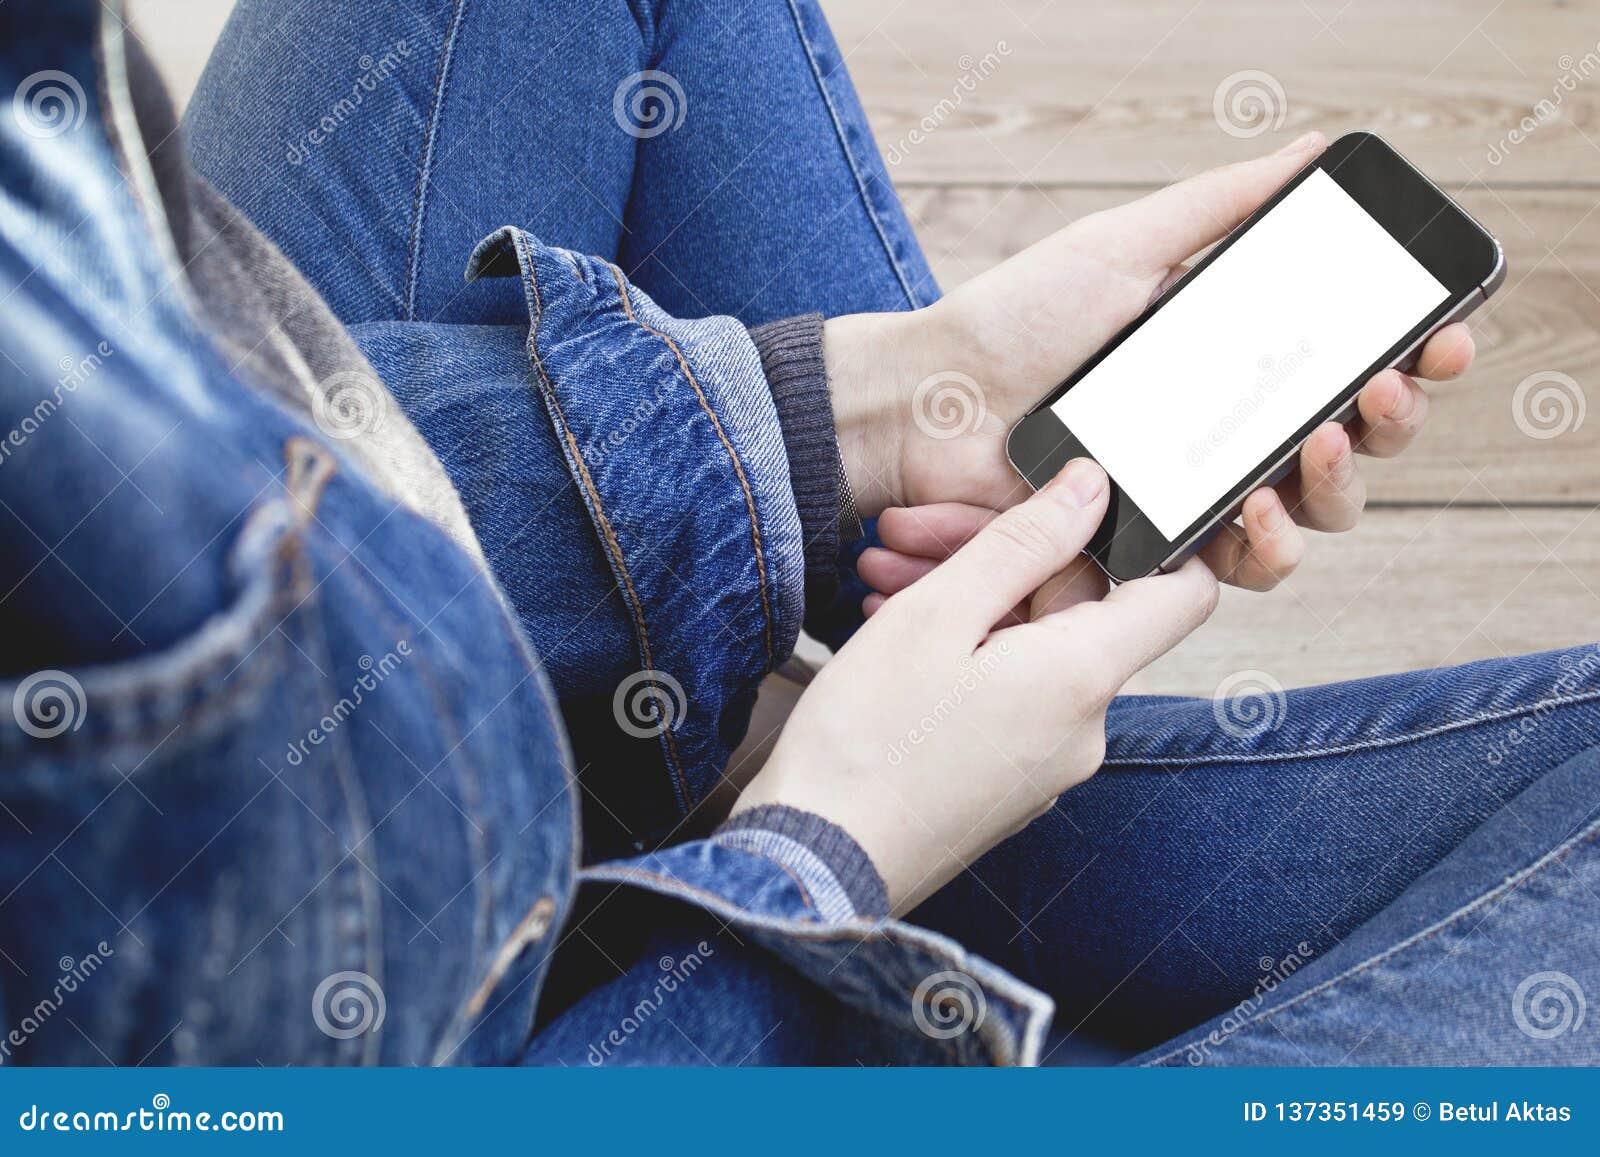 Woman hand using smartphone.